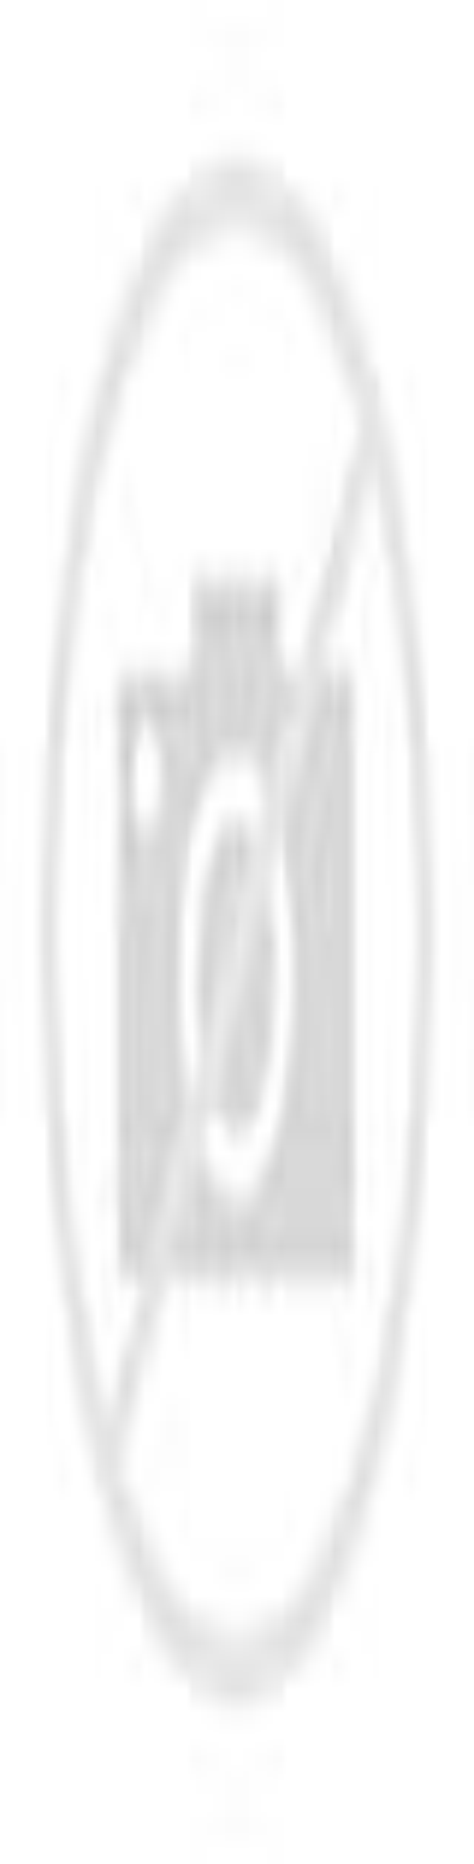 expanding brain meme template expanding brain zarrr blank template imgflip